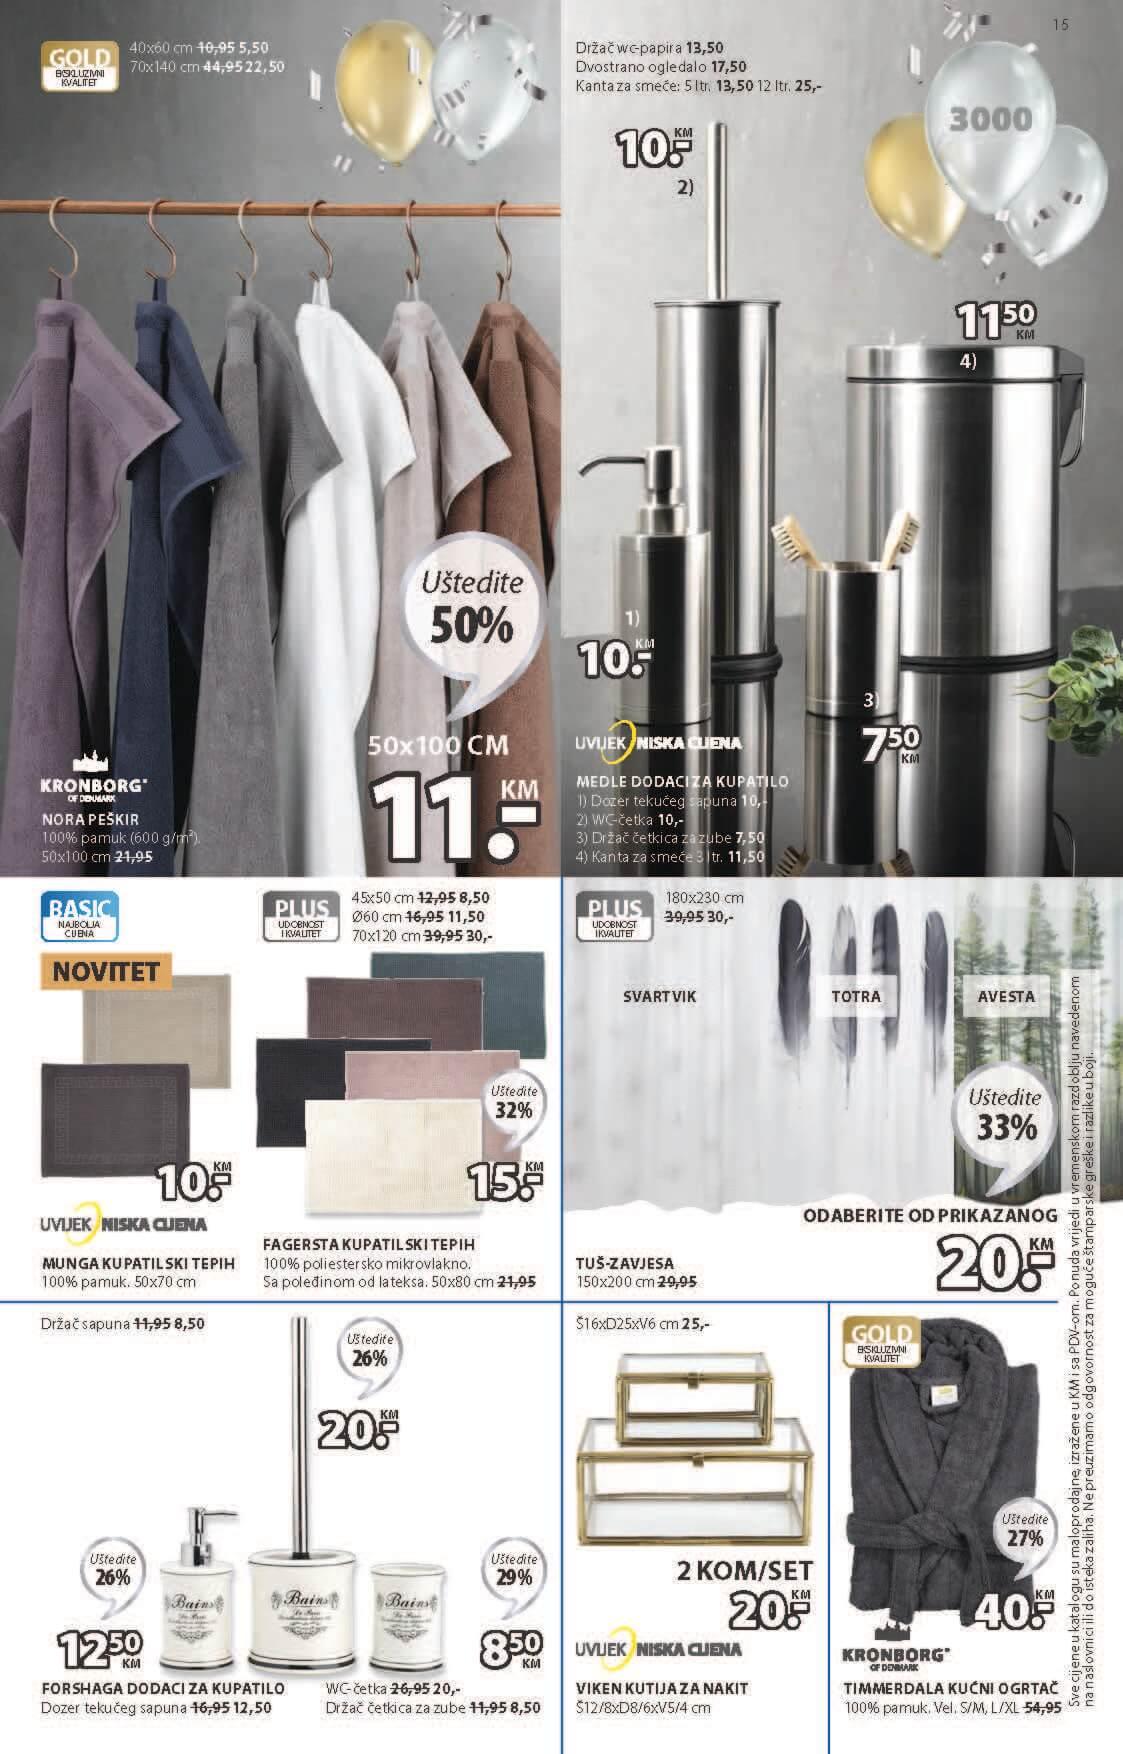 JYSK Katalog Akcijska ponuda MAJ 13.05.2021. 26.05.2021 ekatalozi.com Page 16